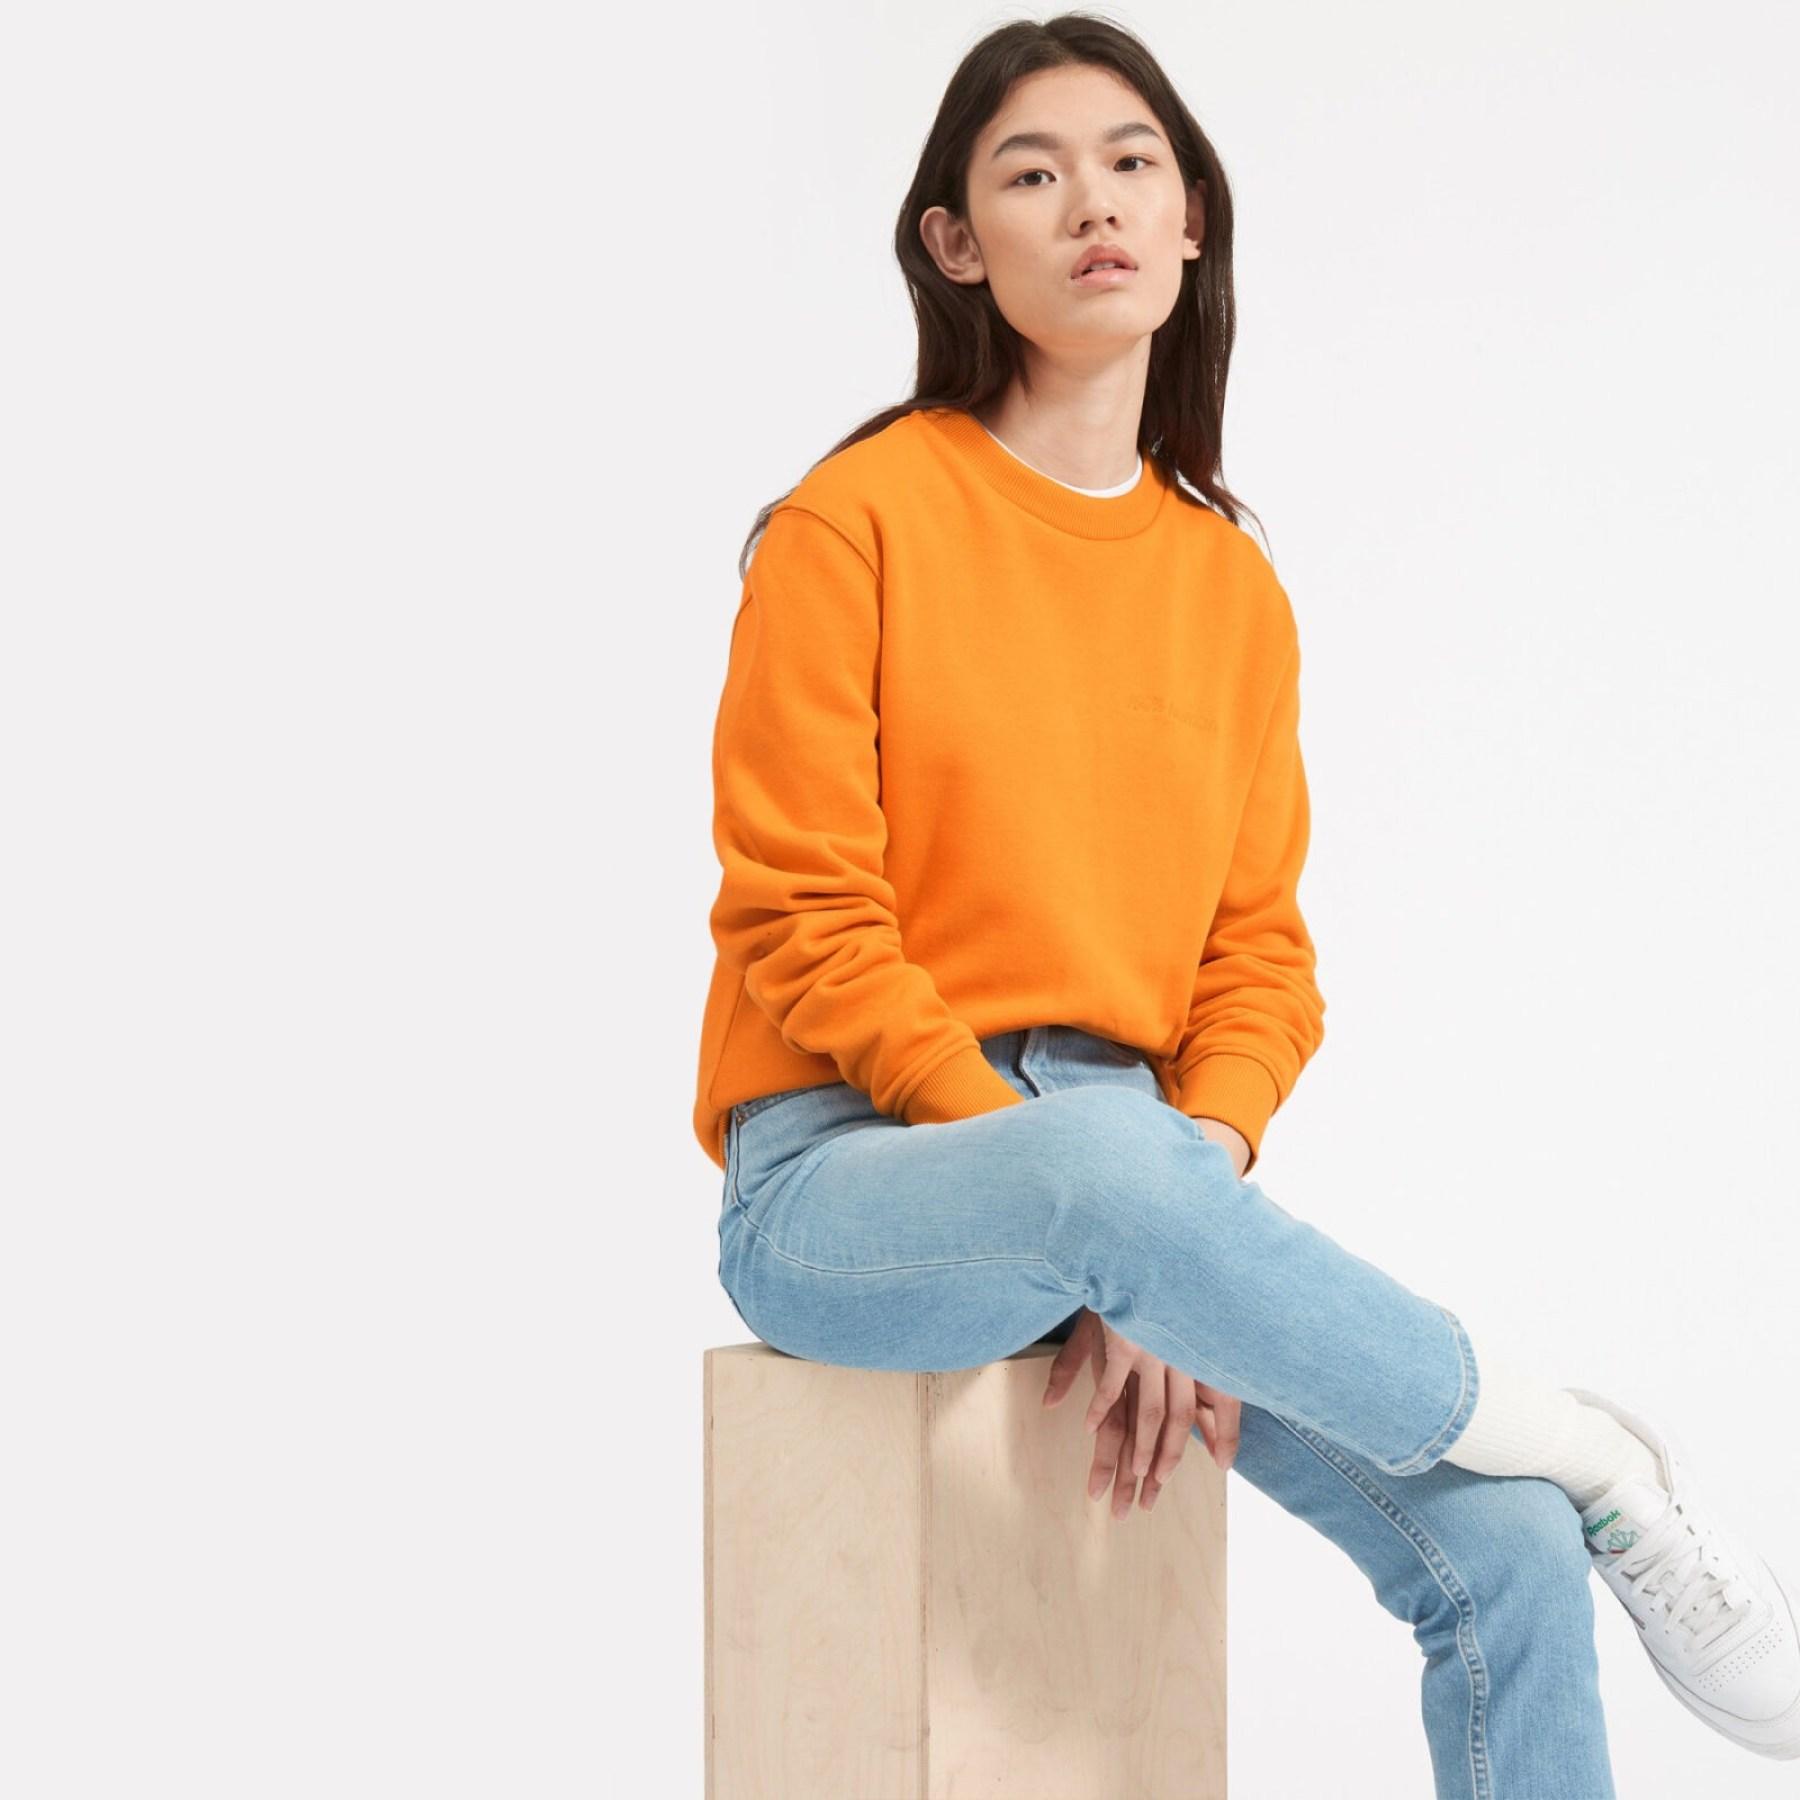 everlane edit seven shop for your star sign toronto 2018